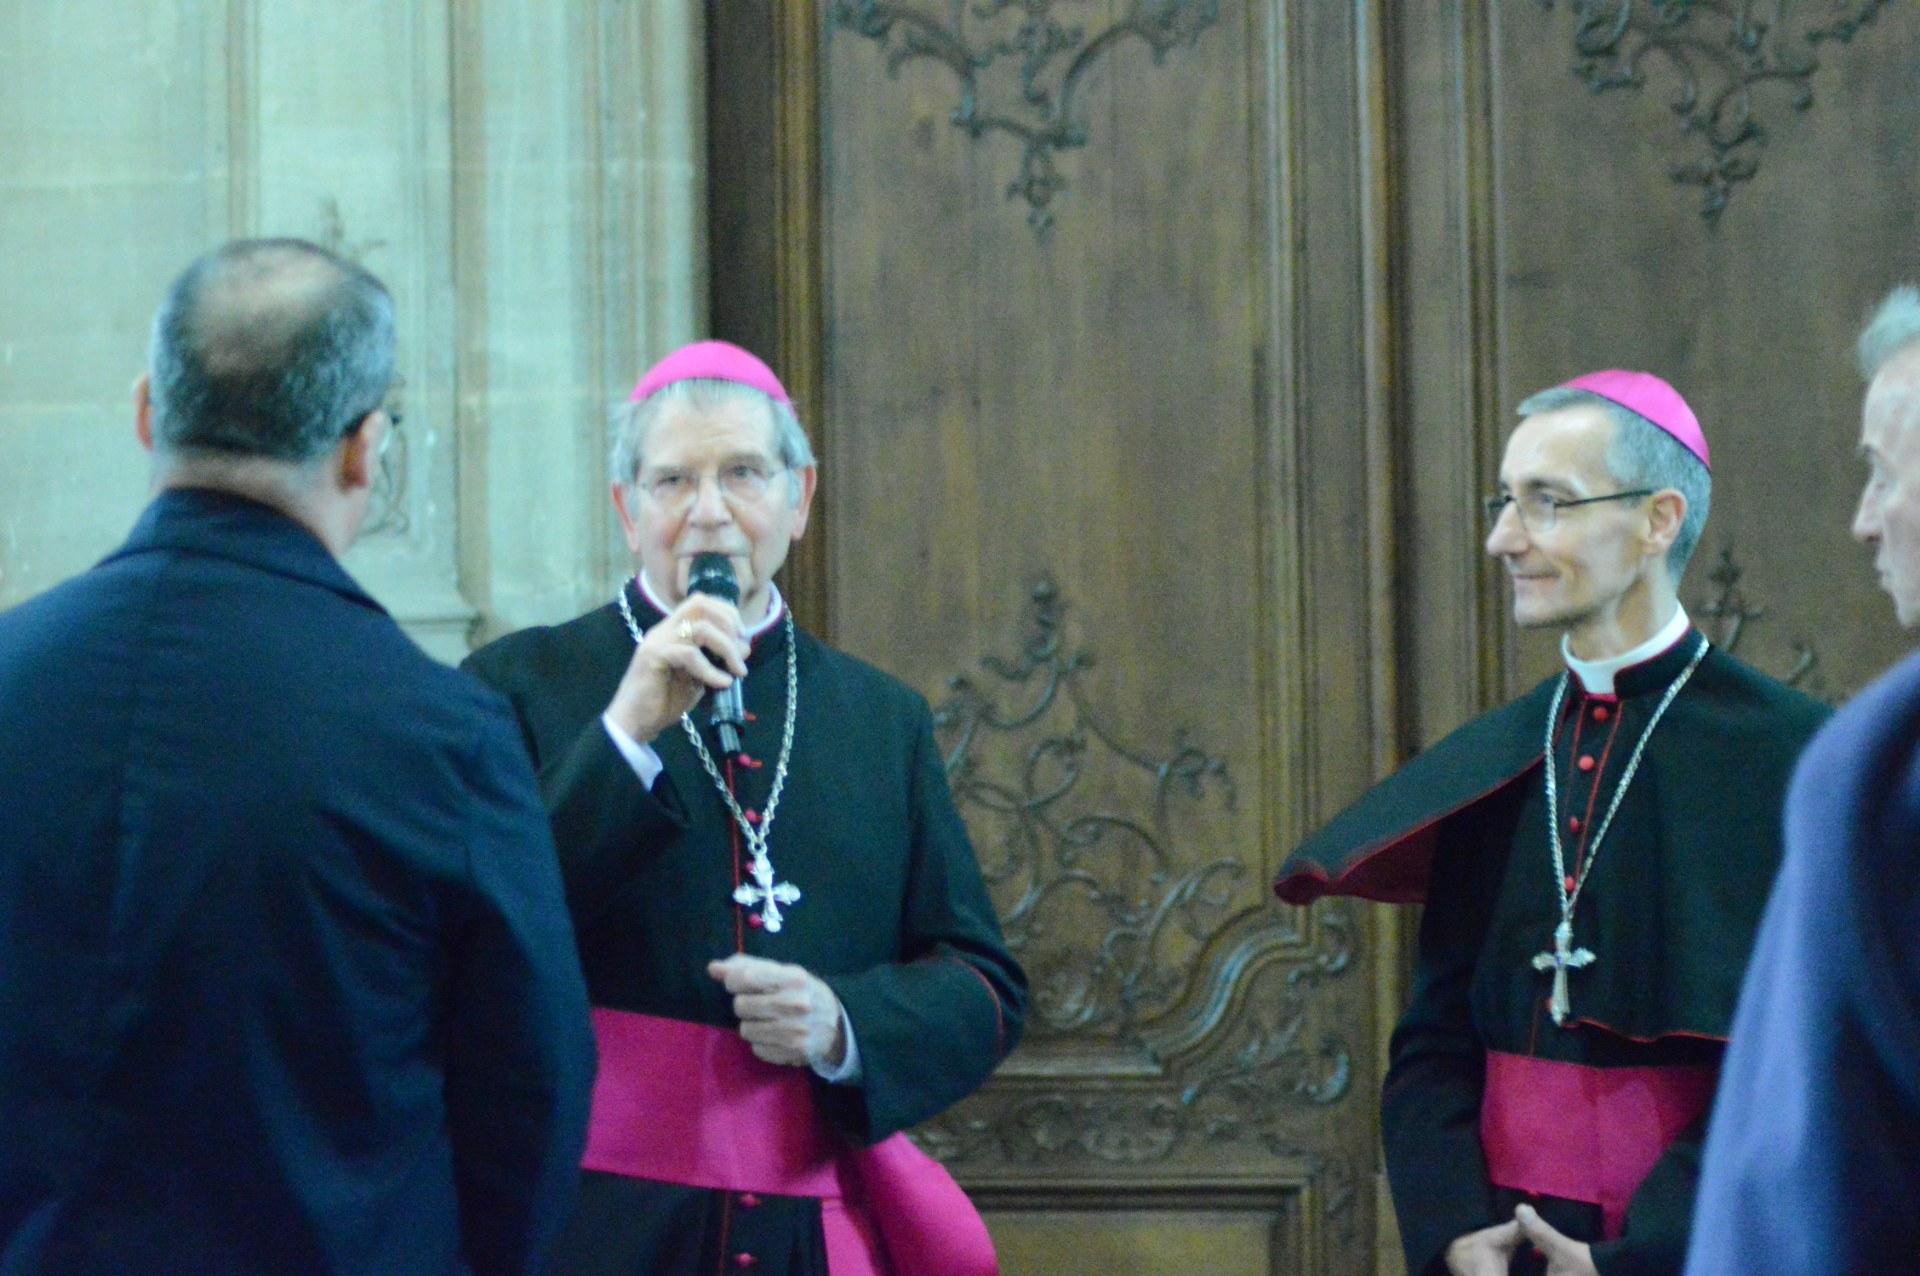 cathédrale accueil 25nov18 4